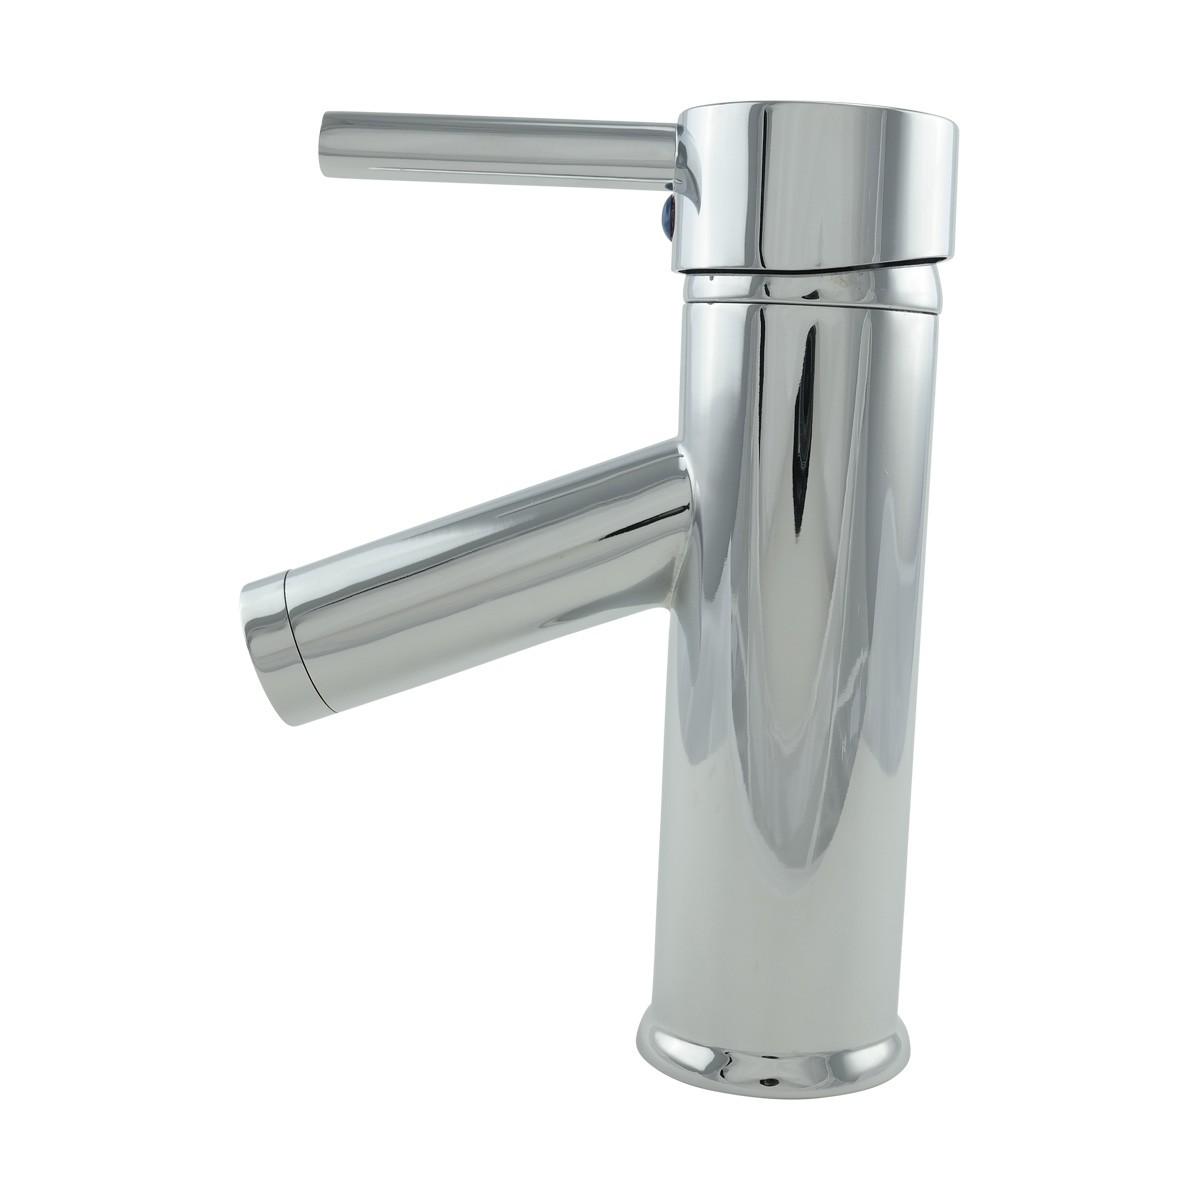 Bathroom Faucet Single Hole 1 Handle Chrome Plated Brass 7 Single Hole Faucet Bathroom Faucets Bathroom Sink Faucet